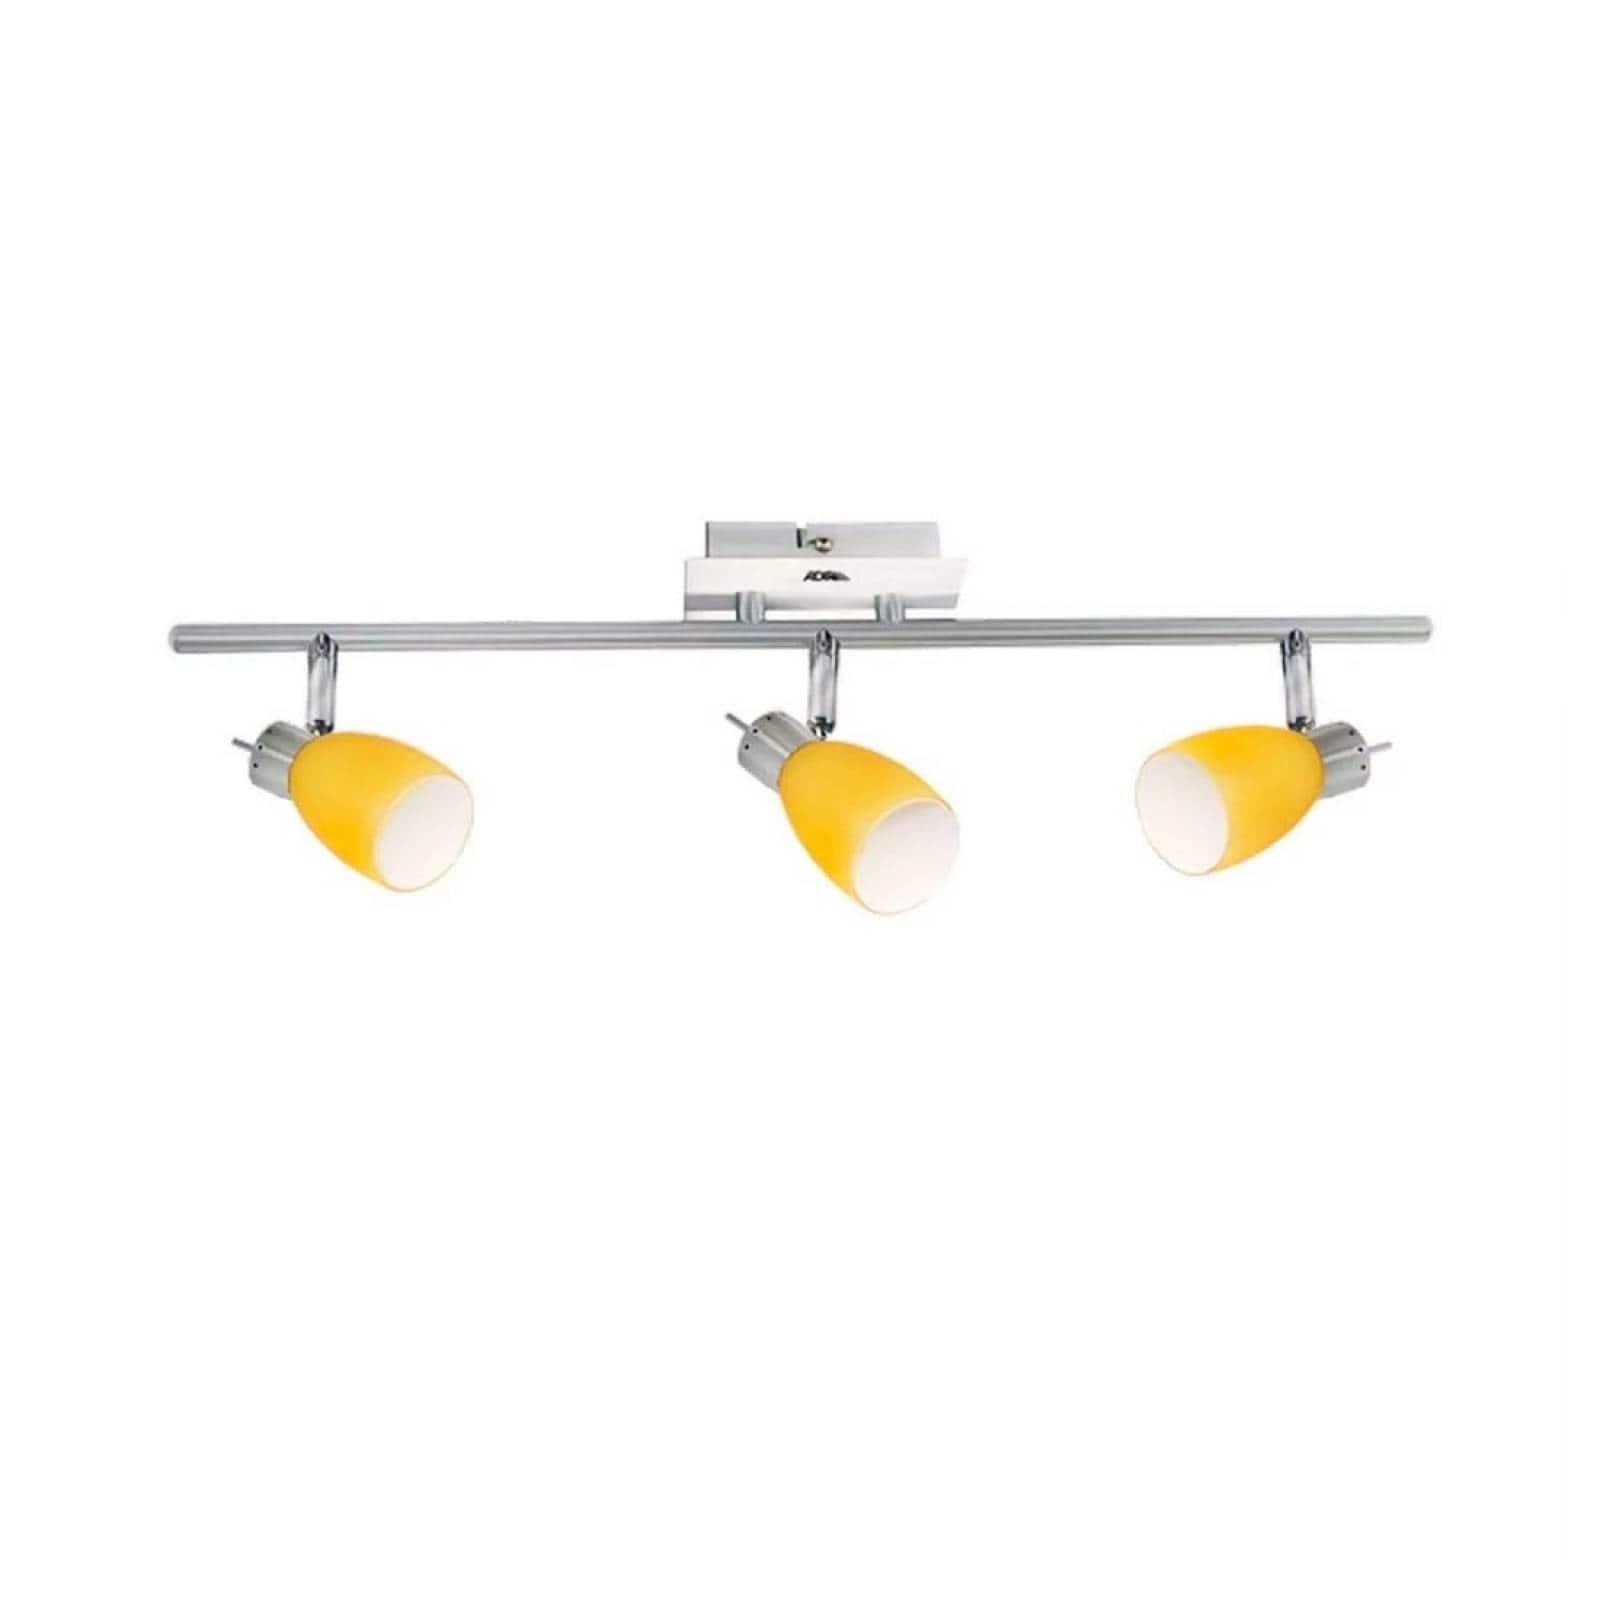 Luminario Riel Decorativo Abercorn 3 Focos Ad-5504 G-9 Adir